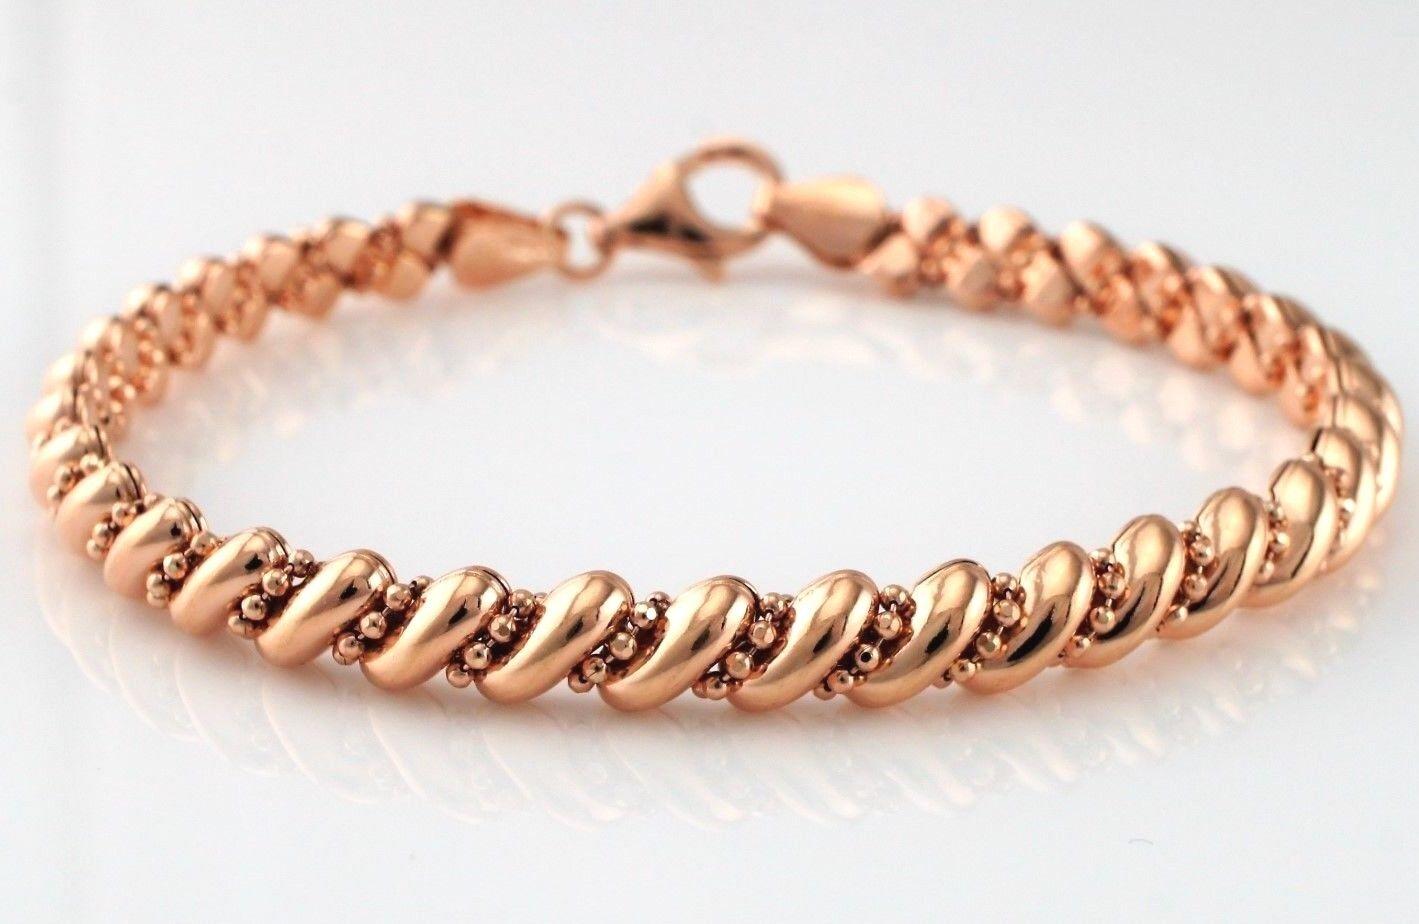 rosa oro oro oro PLATED 925 argentoo Sterling San Marco Stile Braccialetto 7.5  c40a65